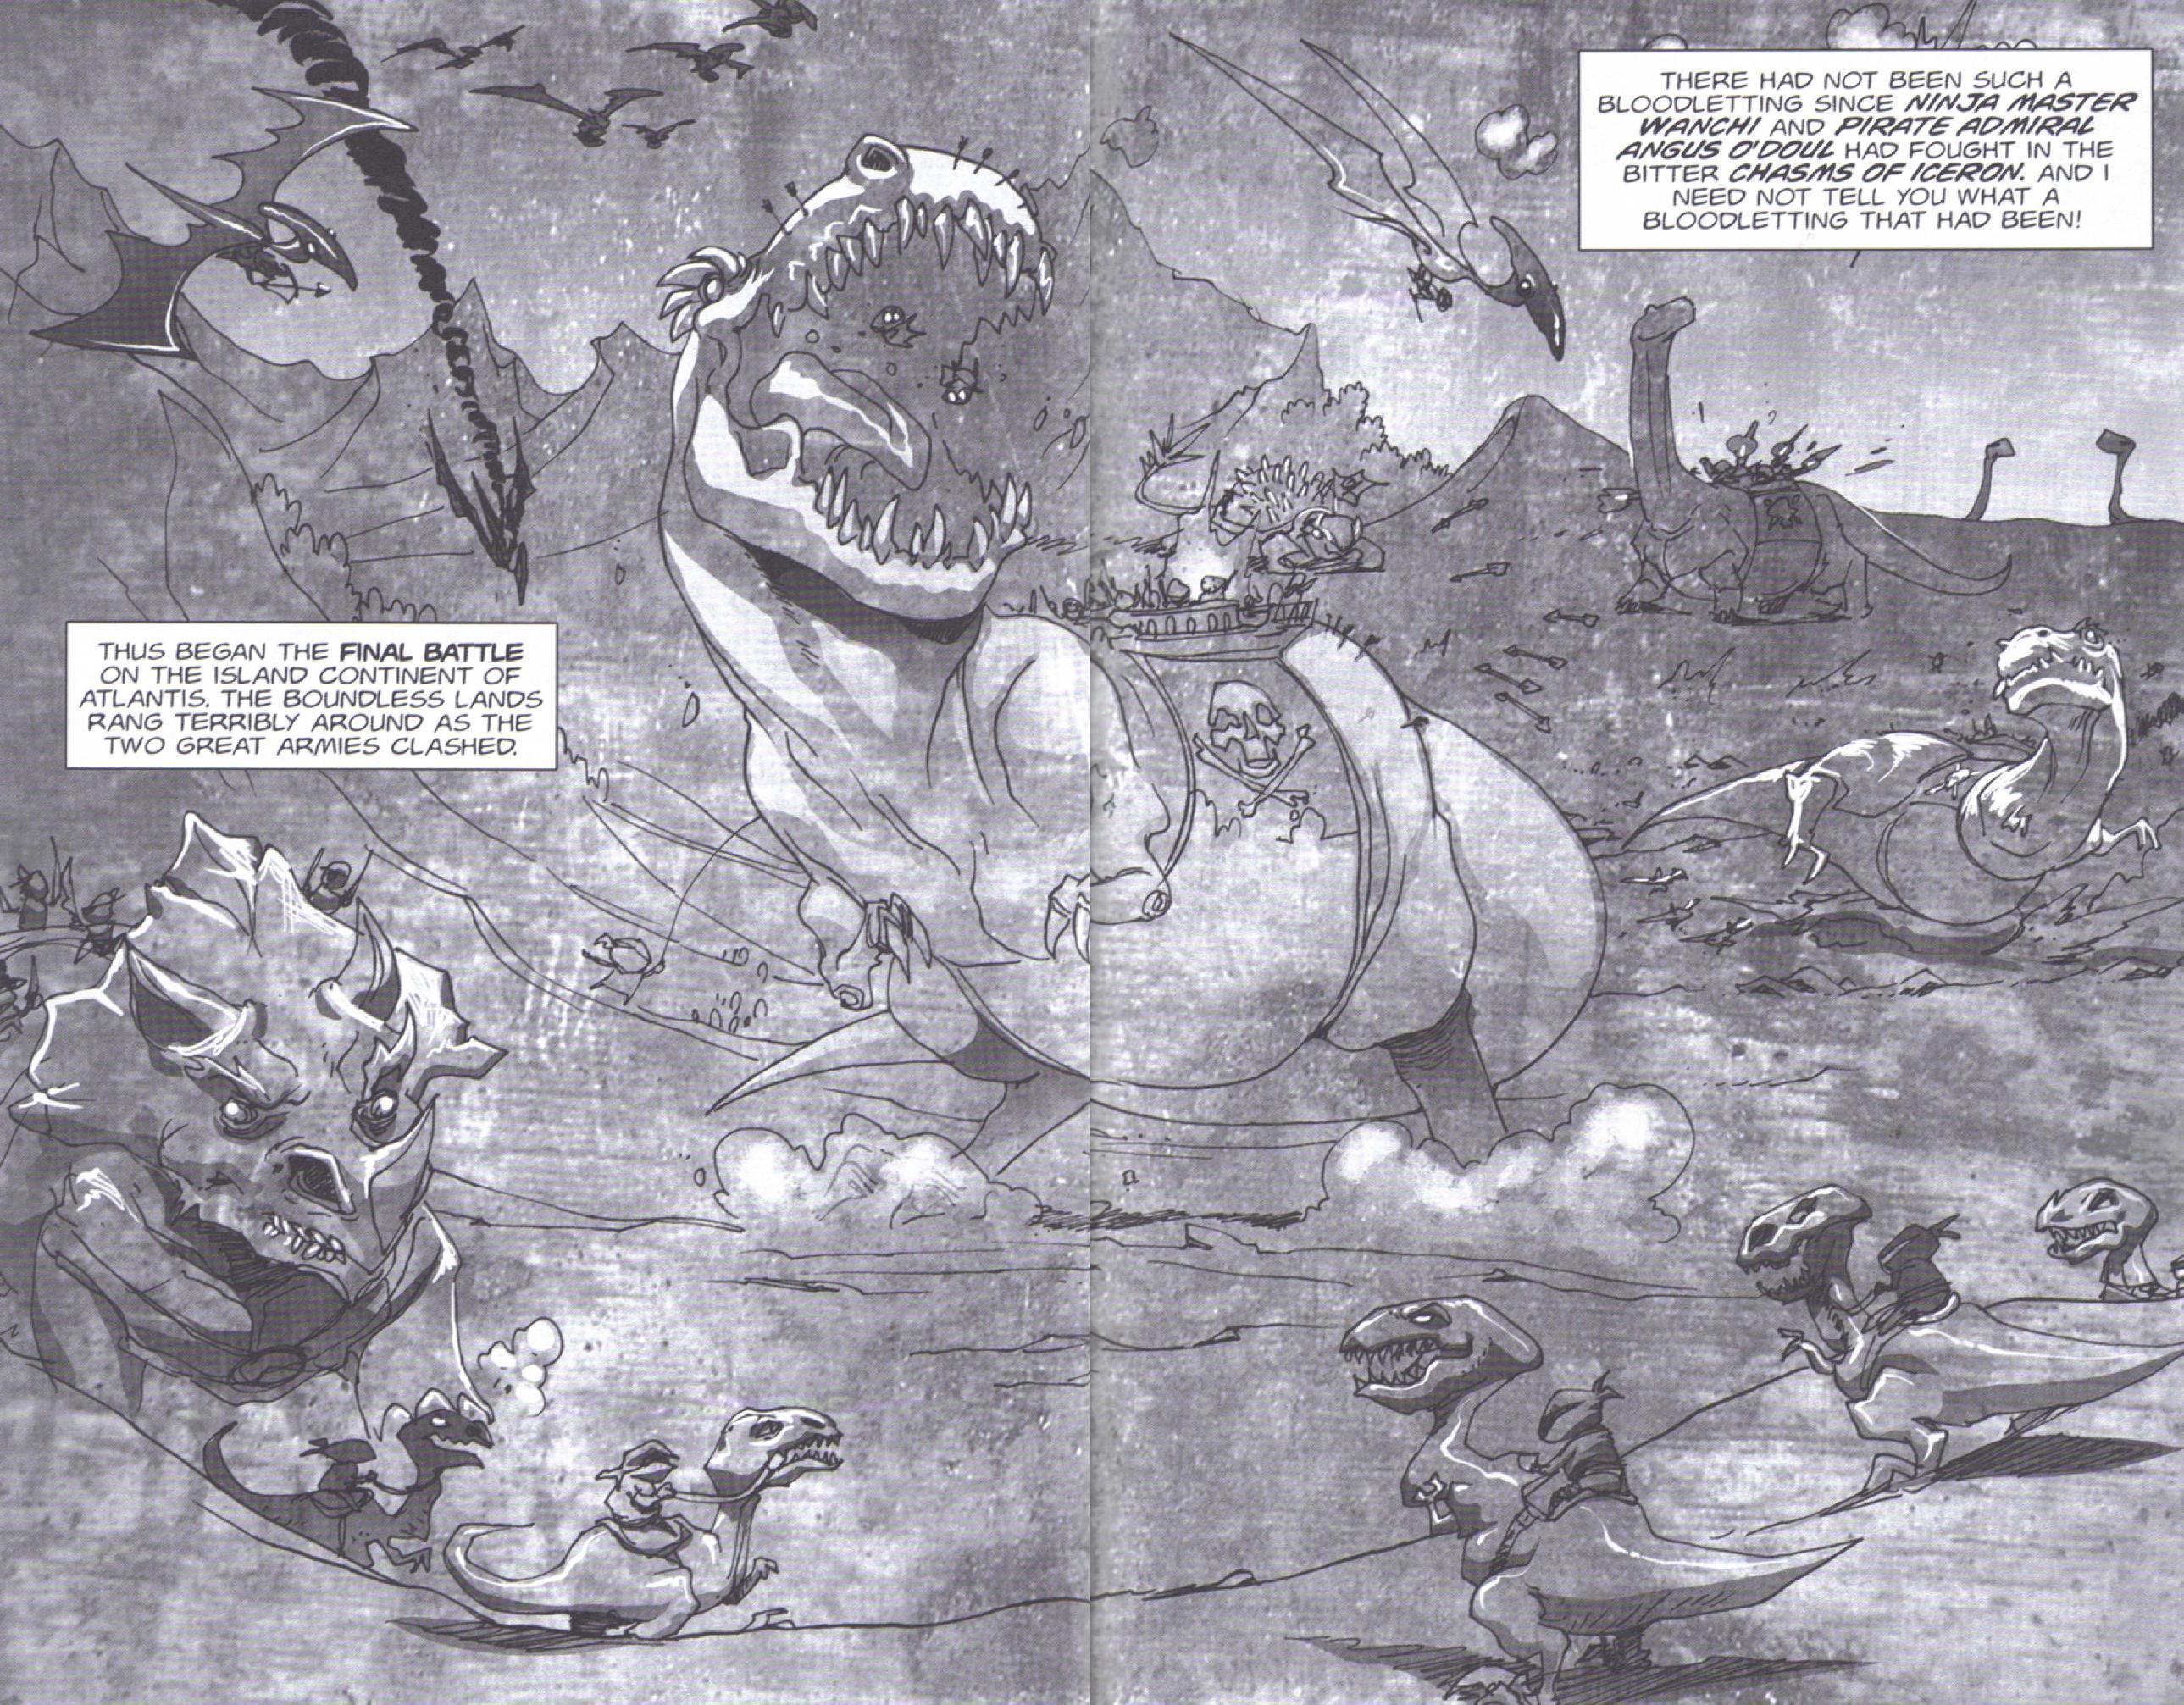 Read online Pirates vs. Ninjas: Global Harming comic -  Issue # Full - 23